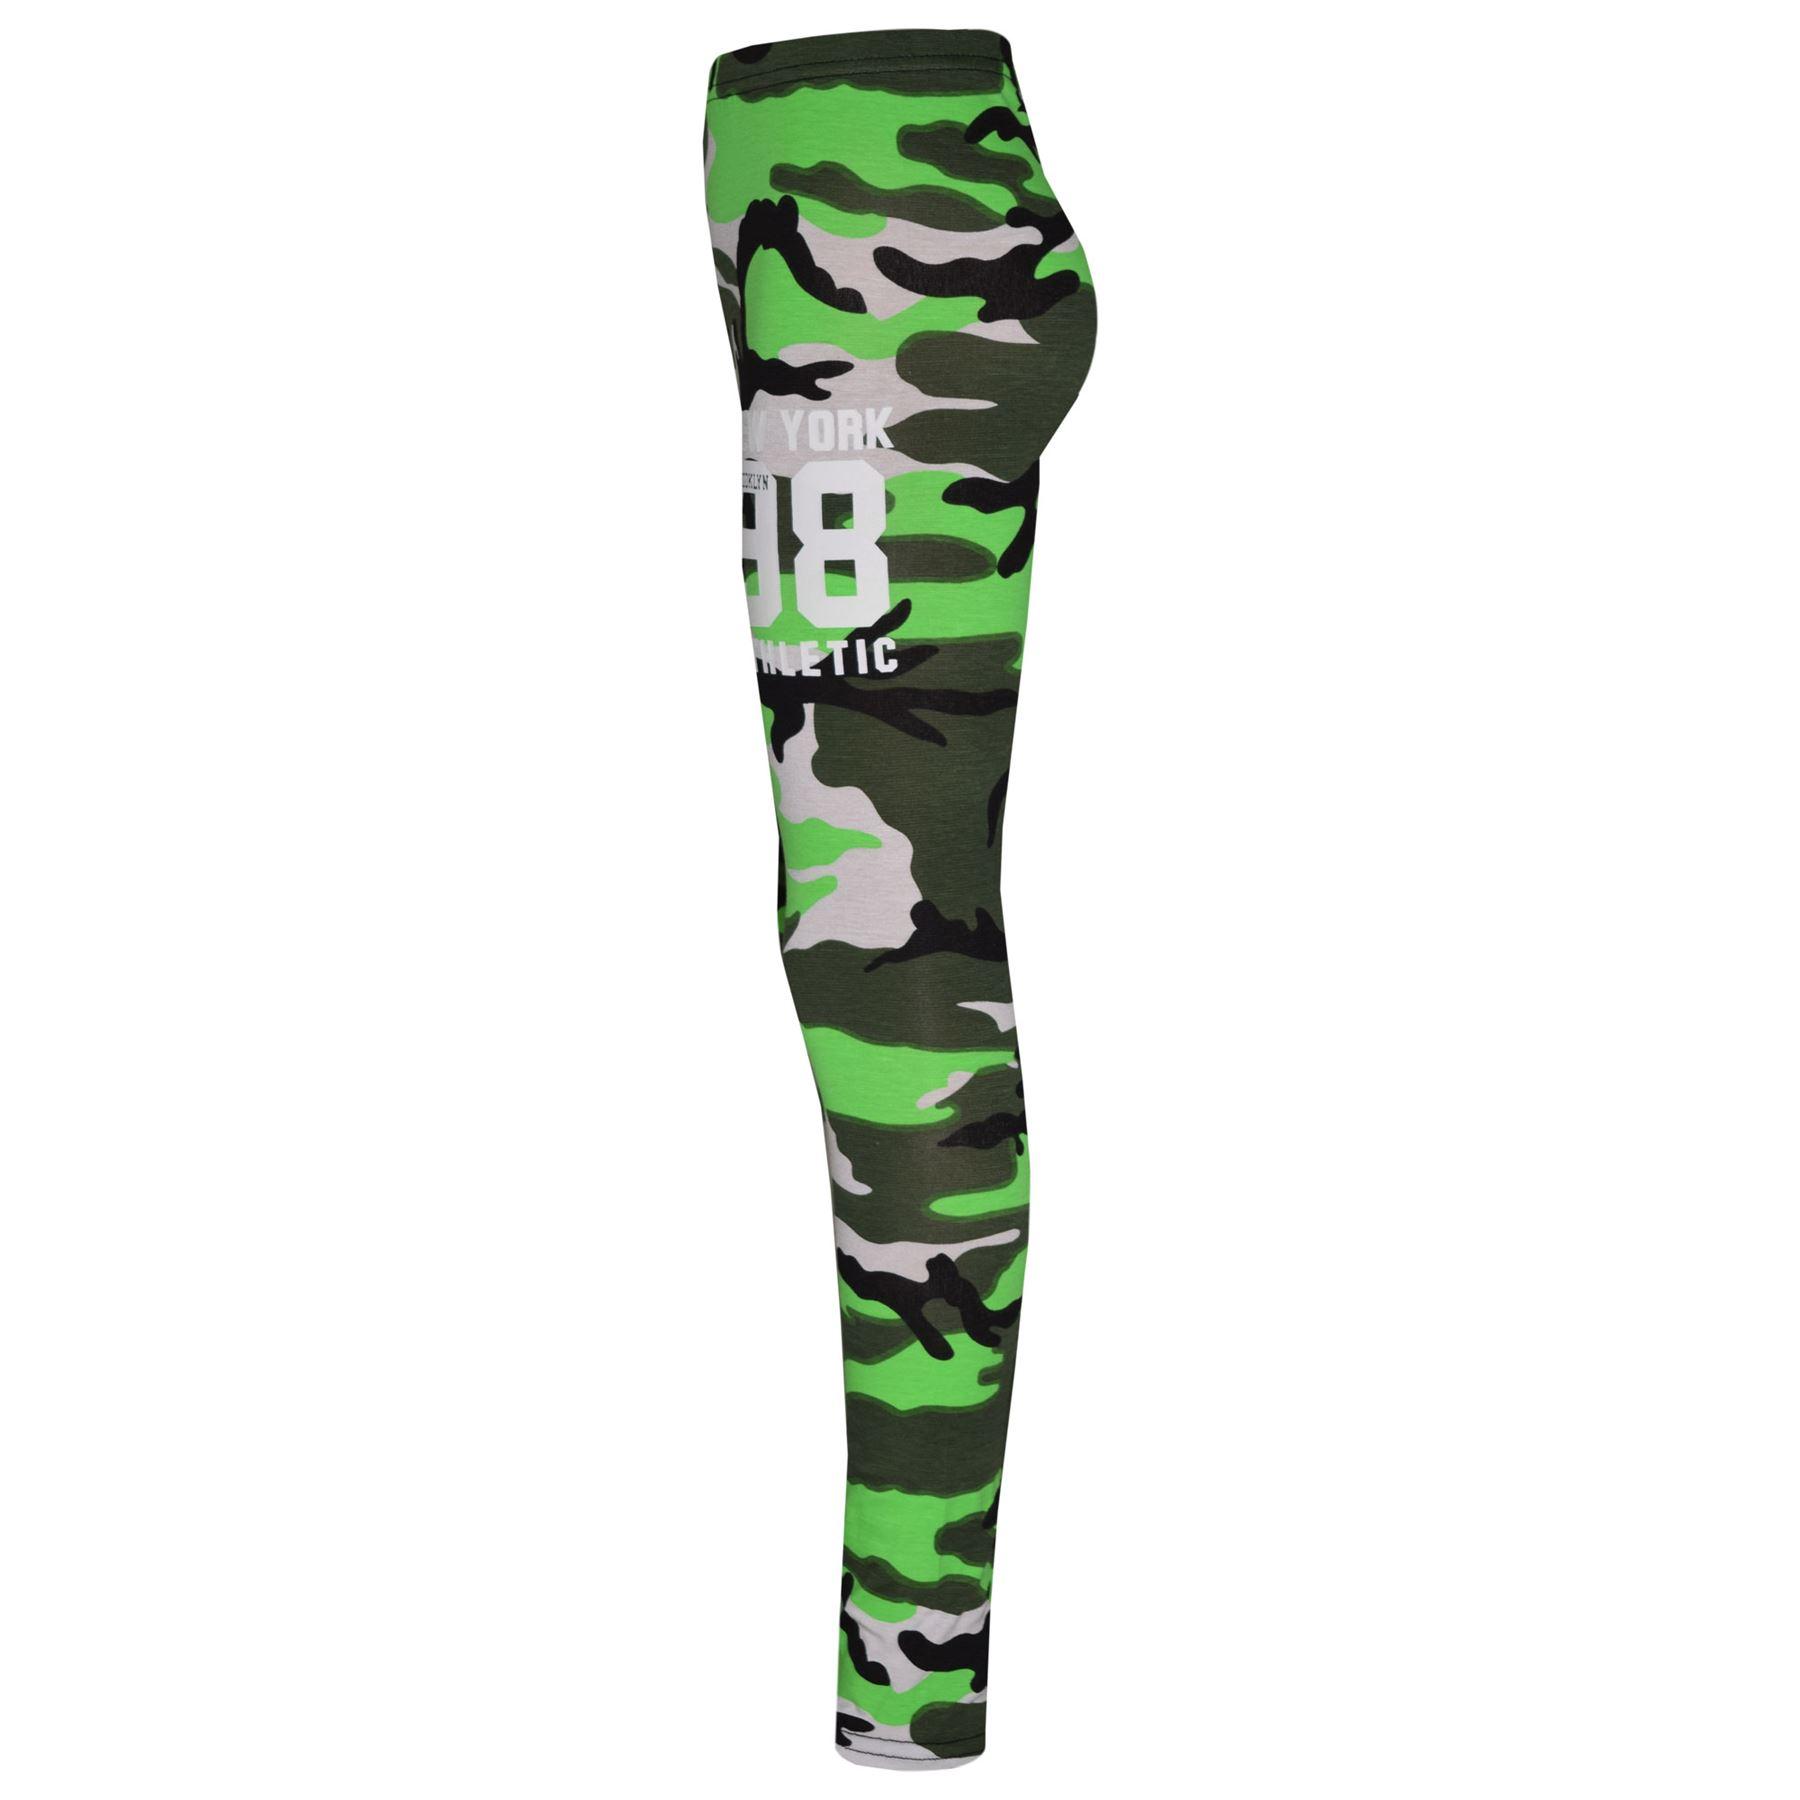 Girls-NEW-YORK-BROOKLYN-98-ATHLECTIC-Camouflage-Print-Top-amp-Legging-Set-7-13-Yr thumbnail 32